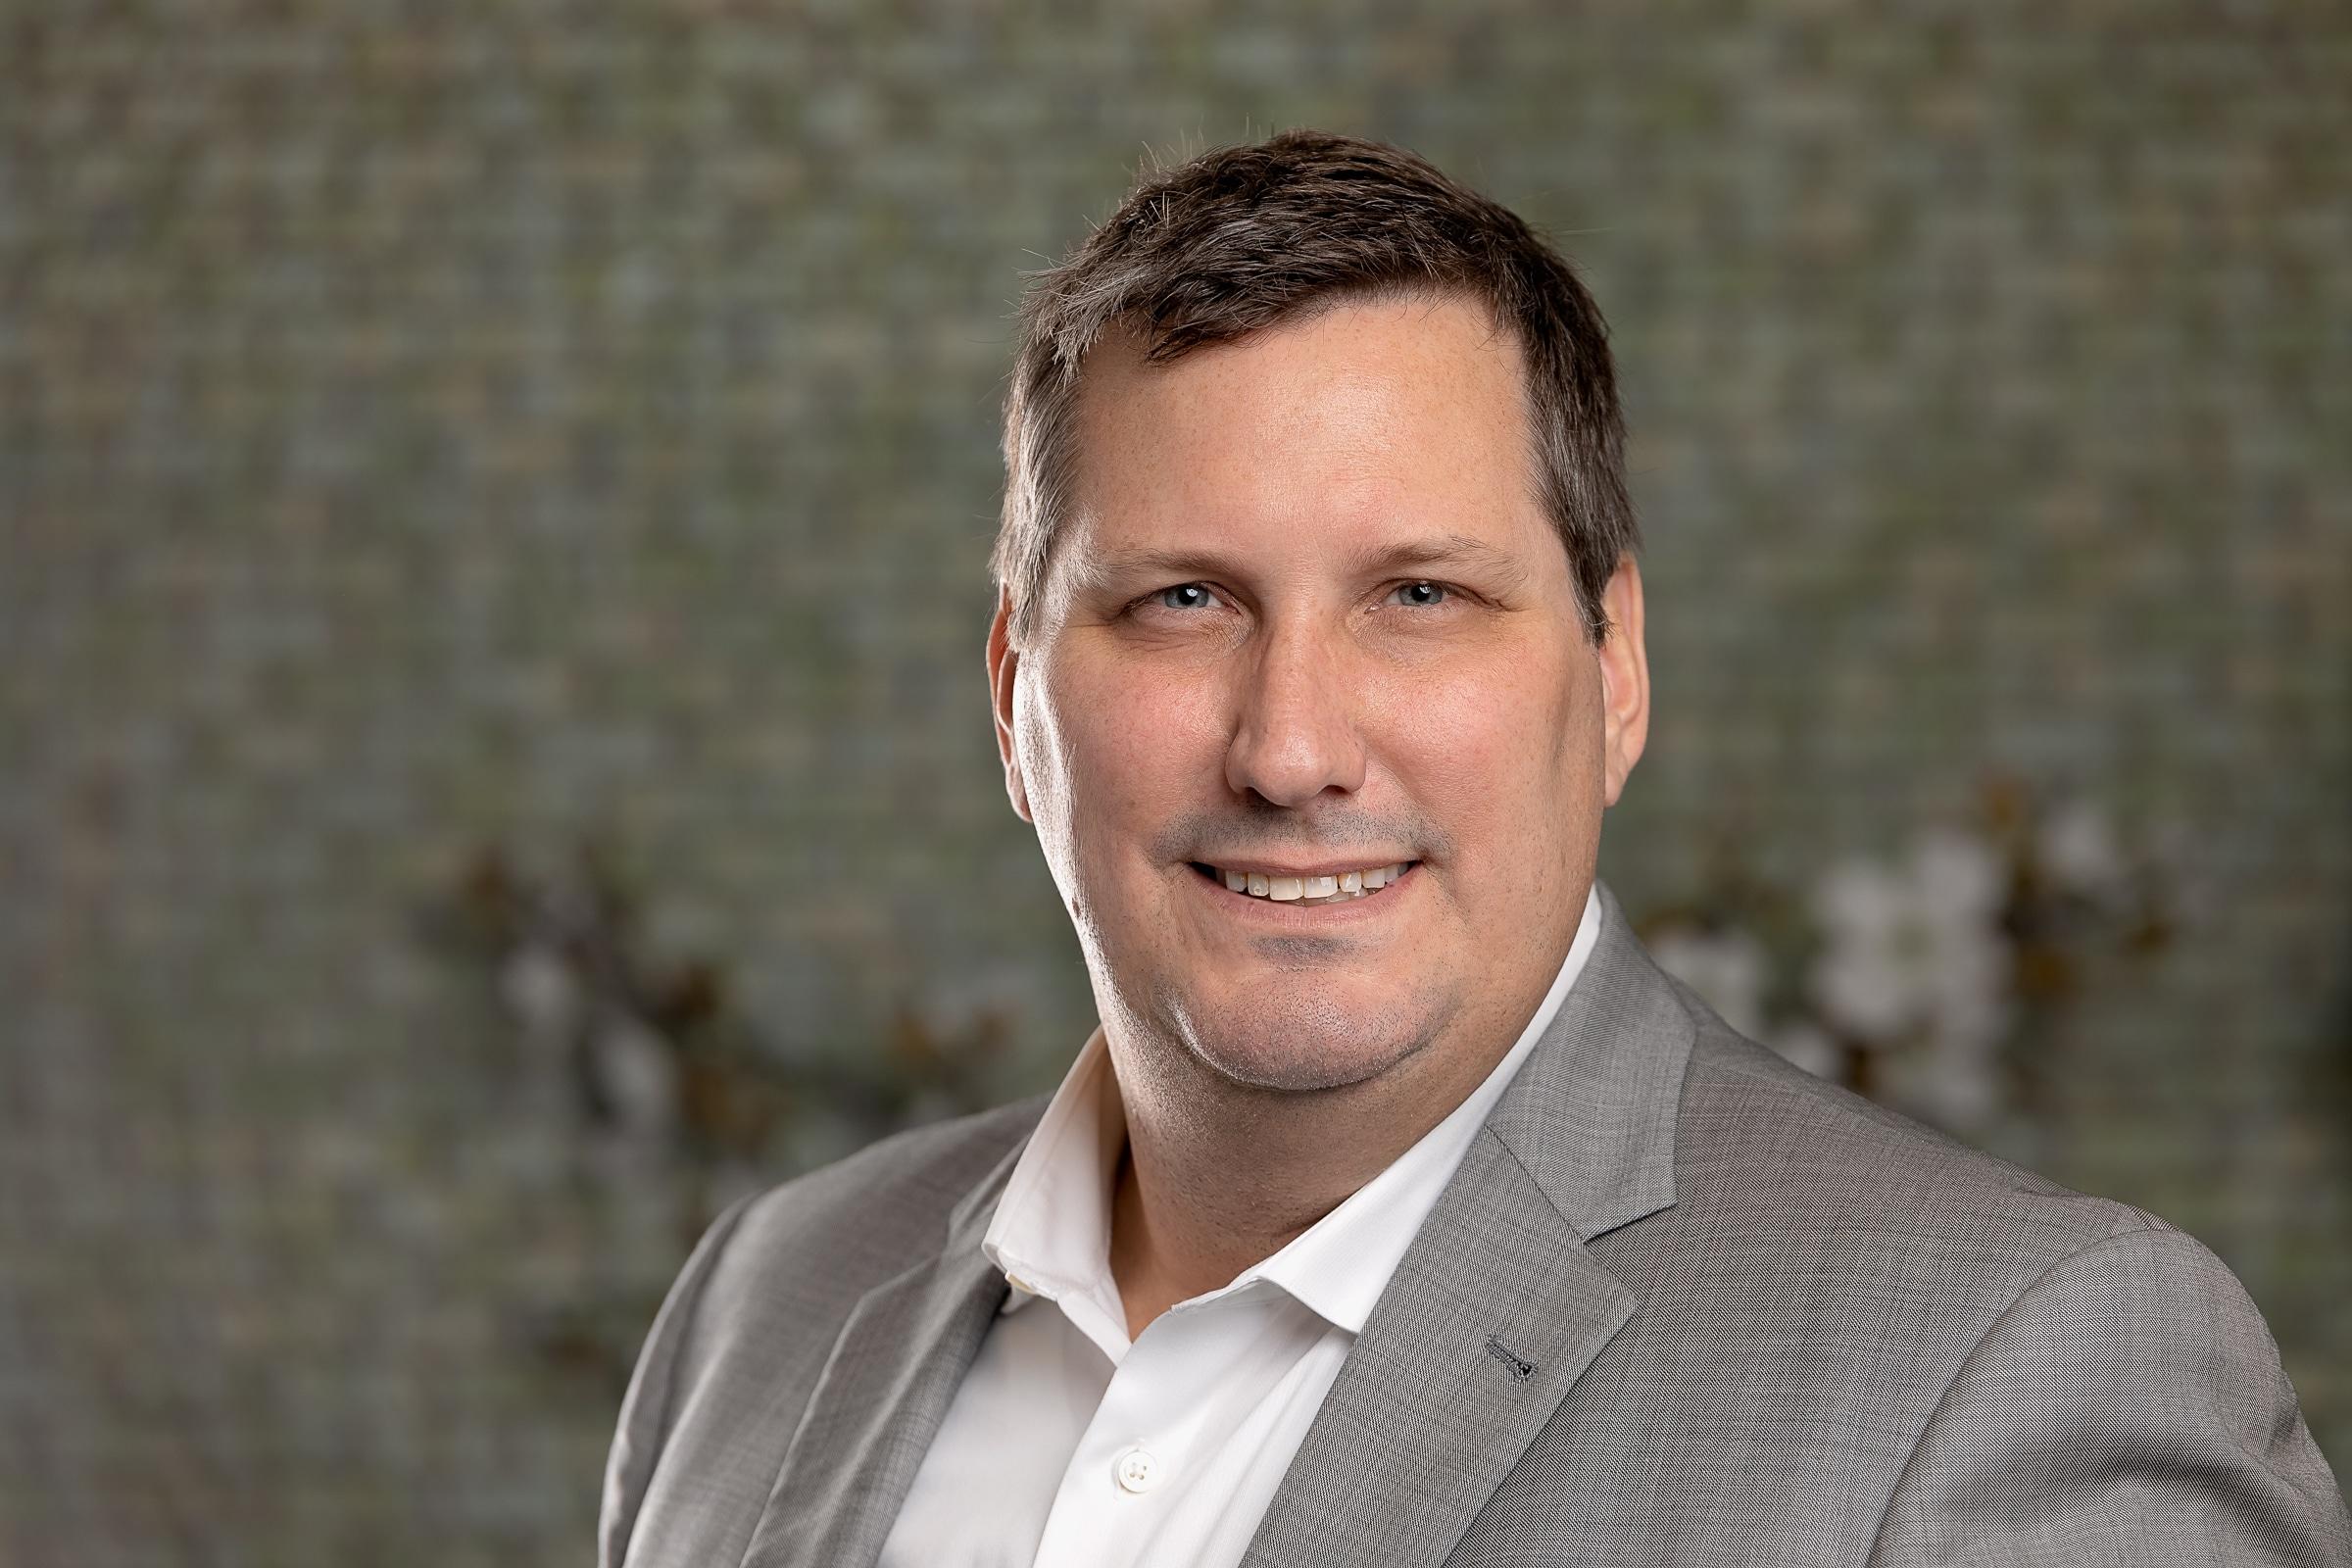 Greg-Tutko-RN-MBA